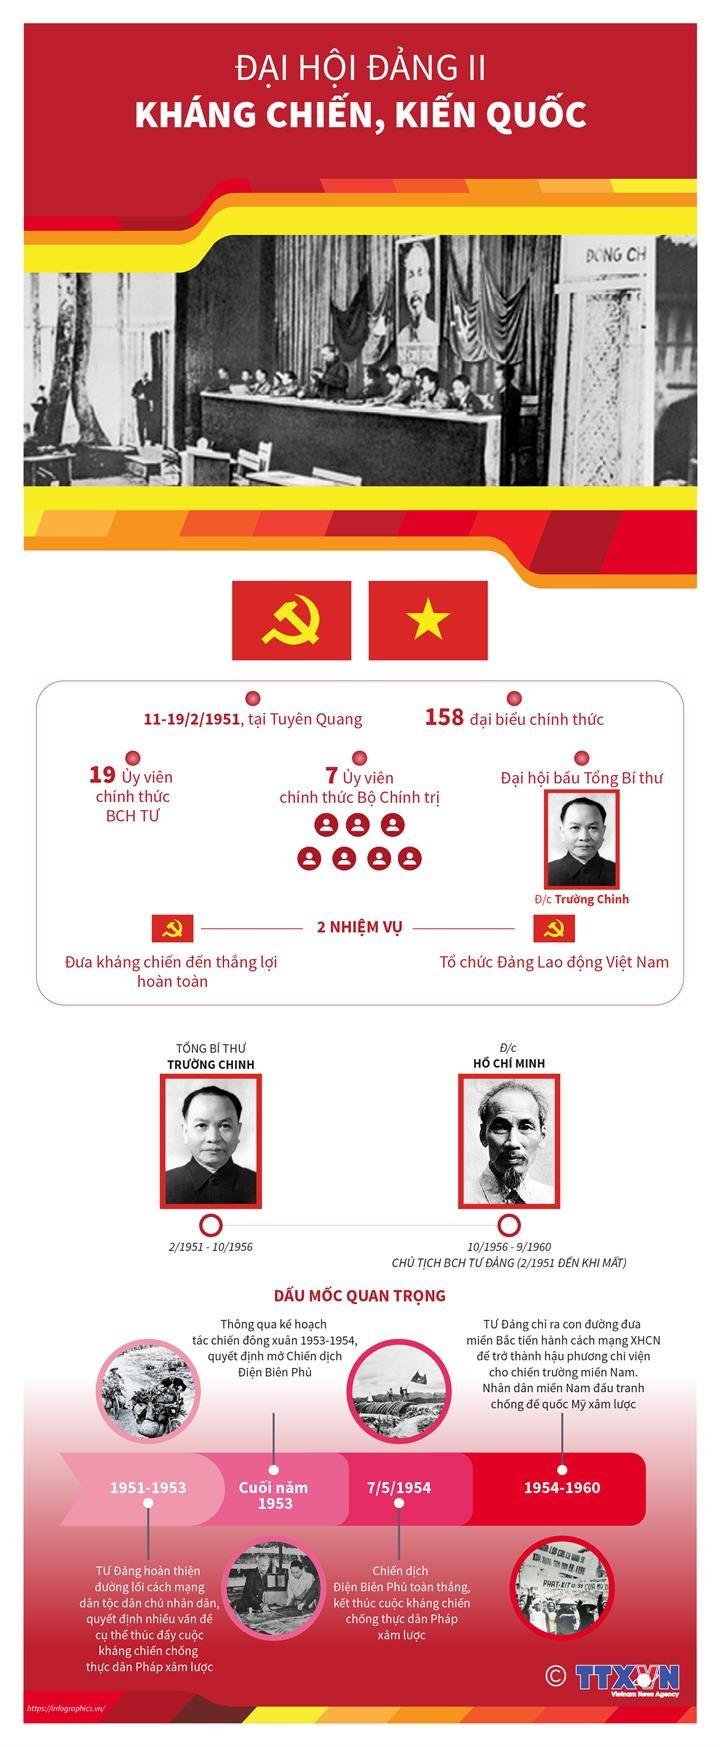 [Infographics] Dai hoi Dang II: Toan dan khang chien, kien quoc hinh anh 1